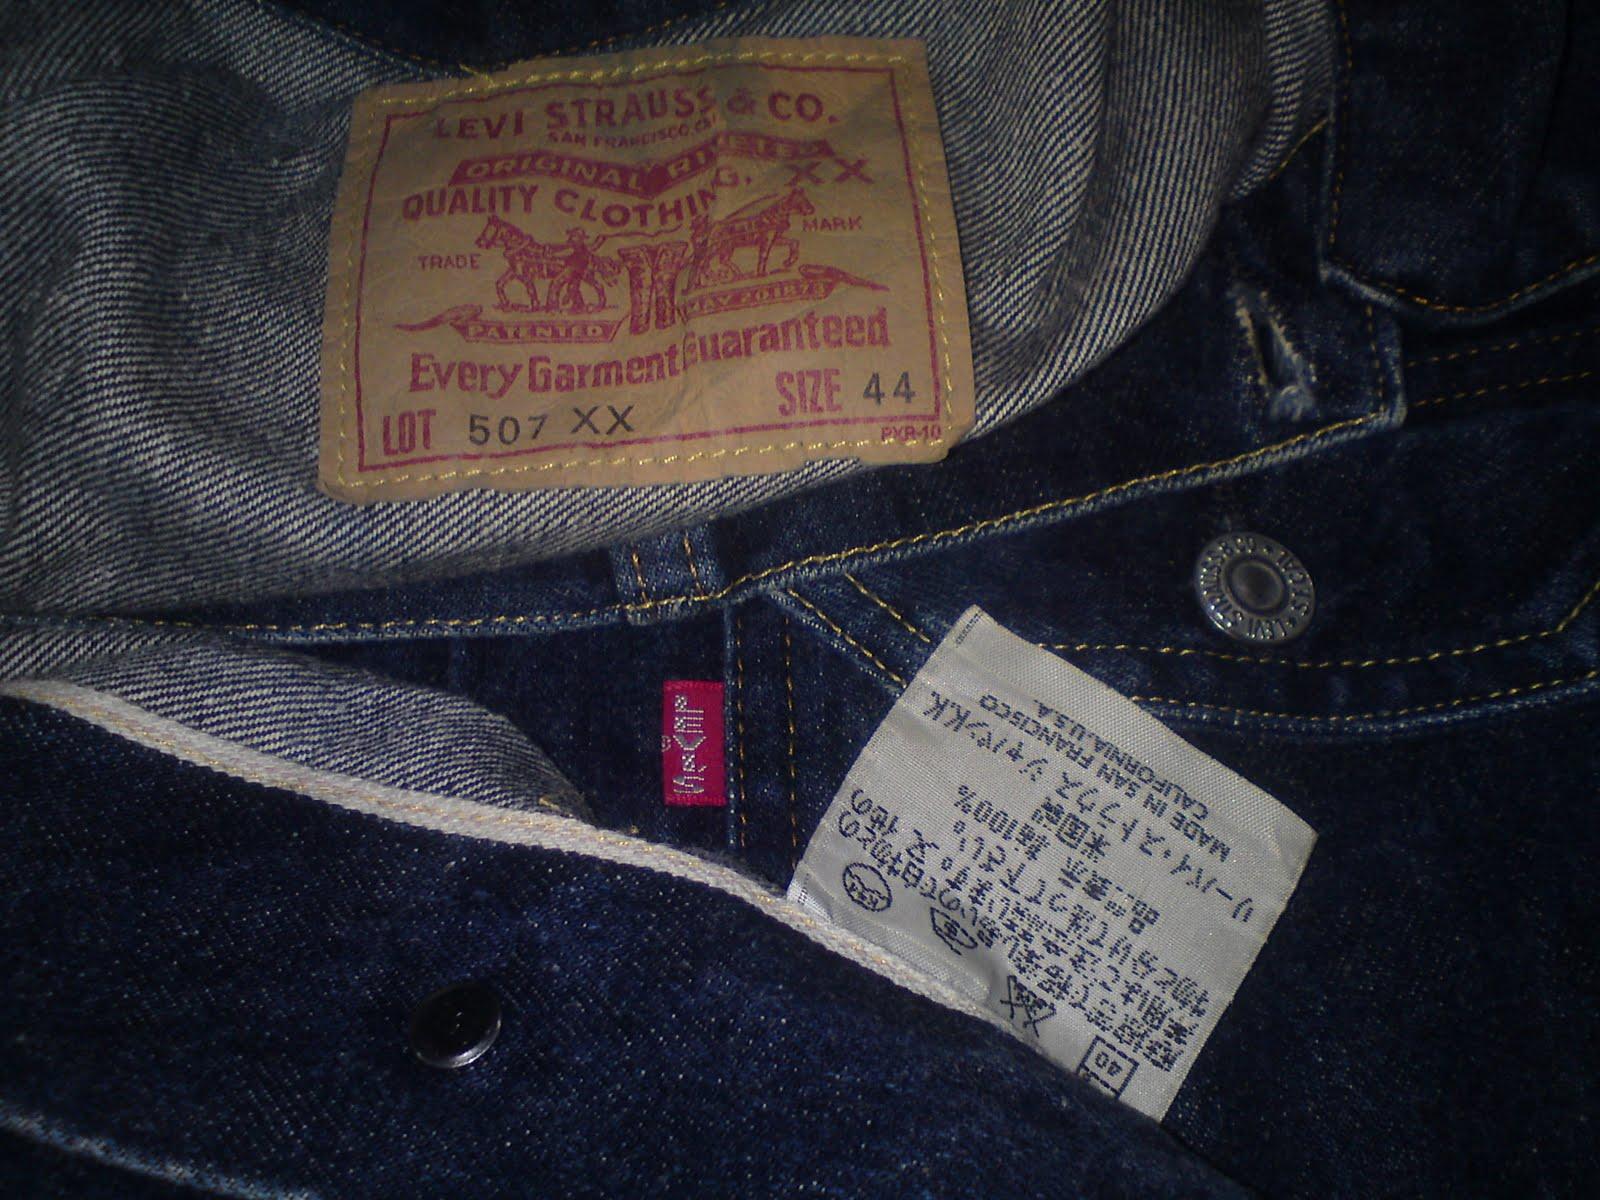 BEGINNER DIVER: authentic USA levi\'s big E selvedge jeans jacket.